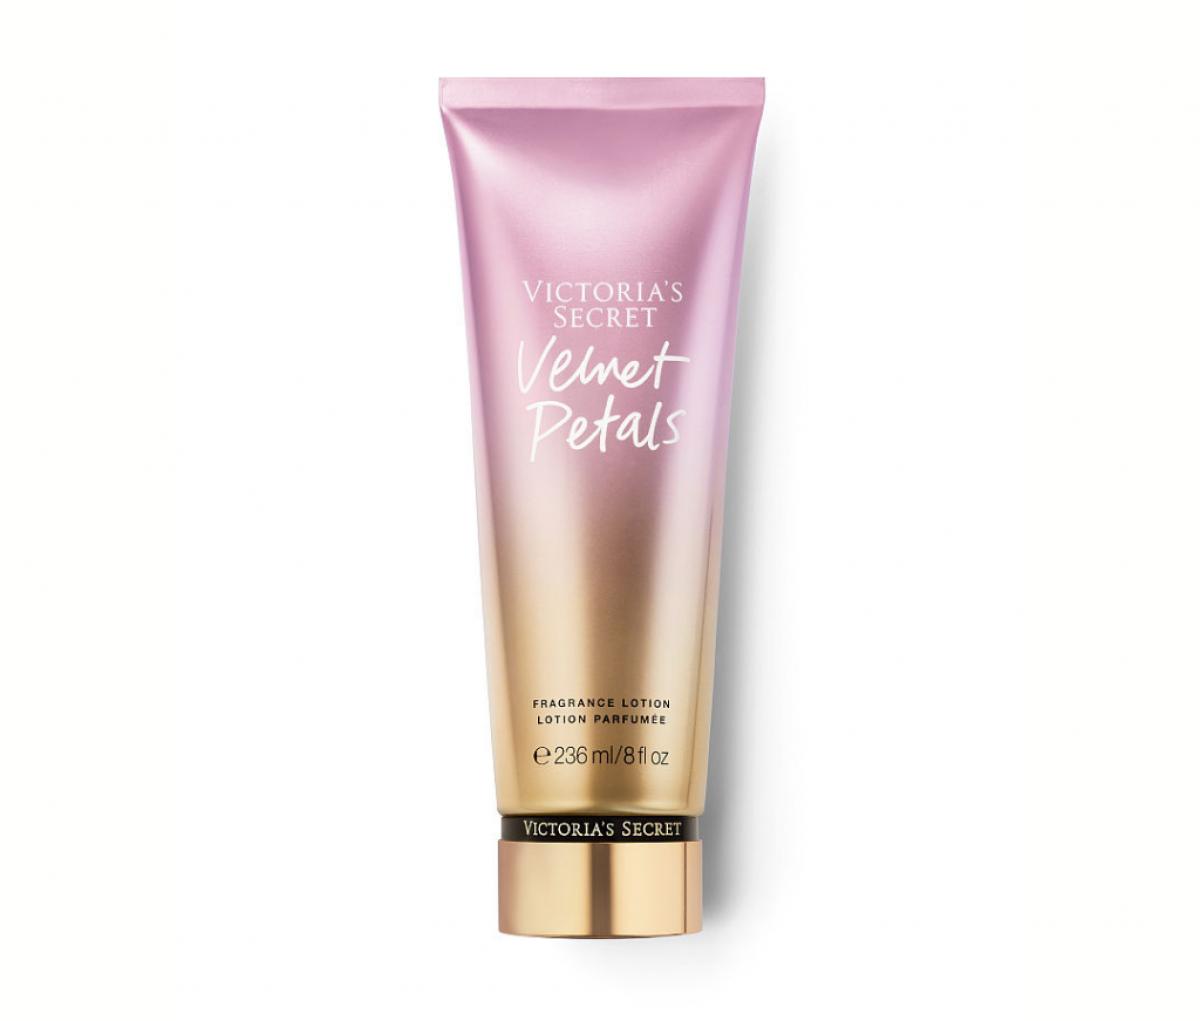 Victoria's Secret Velvet Petals Fragrance Body Lotion